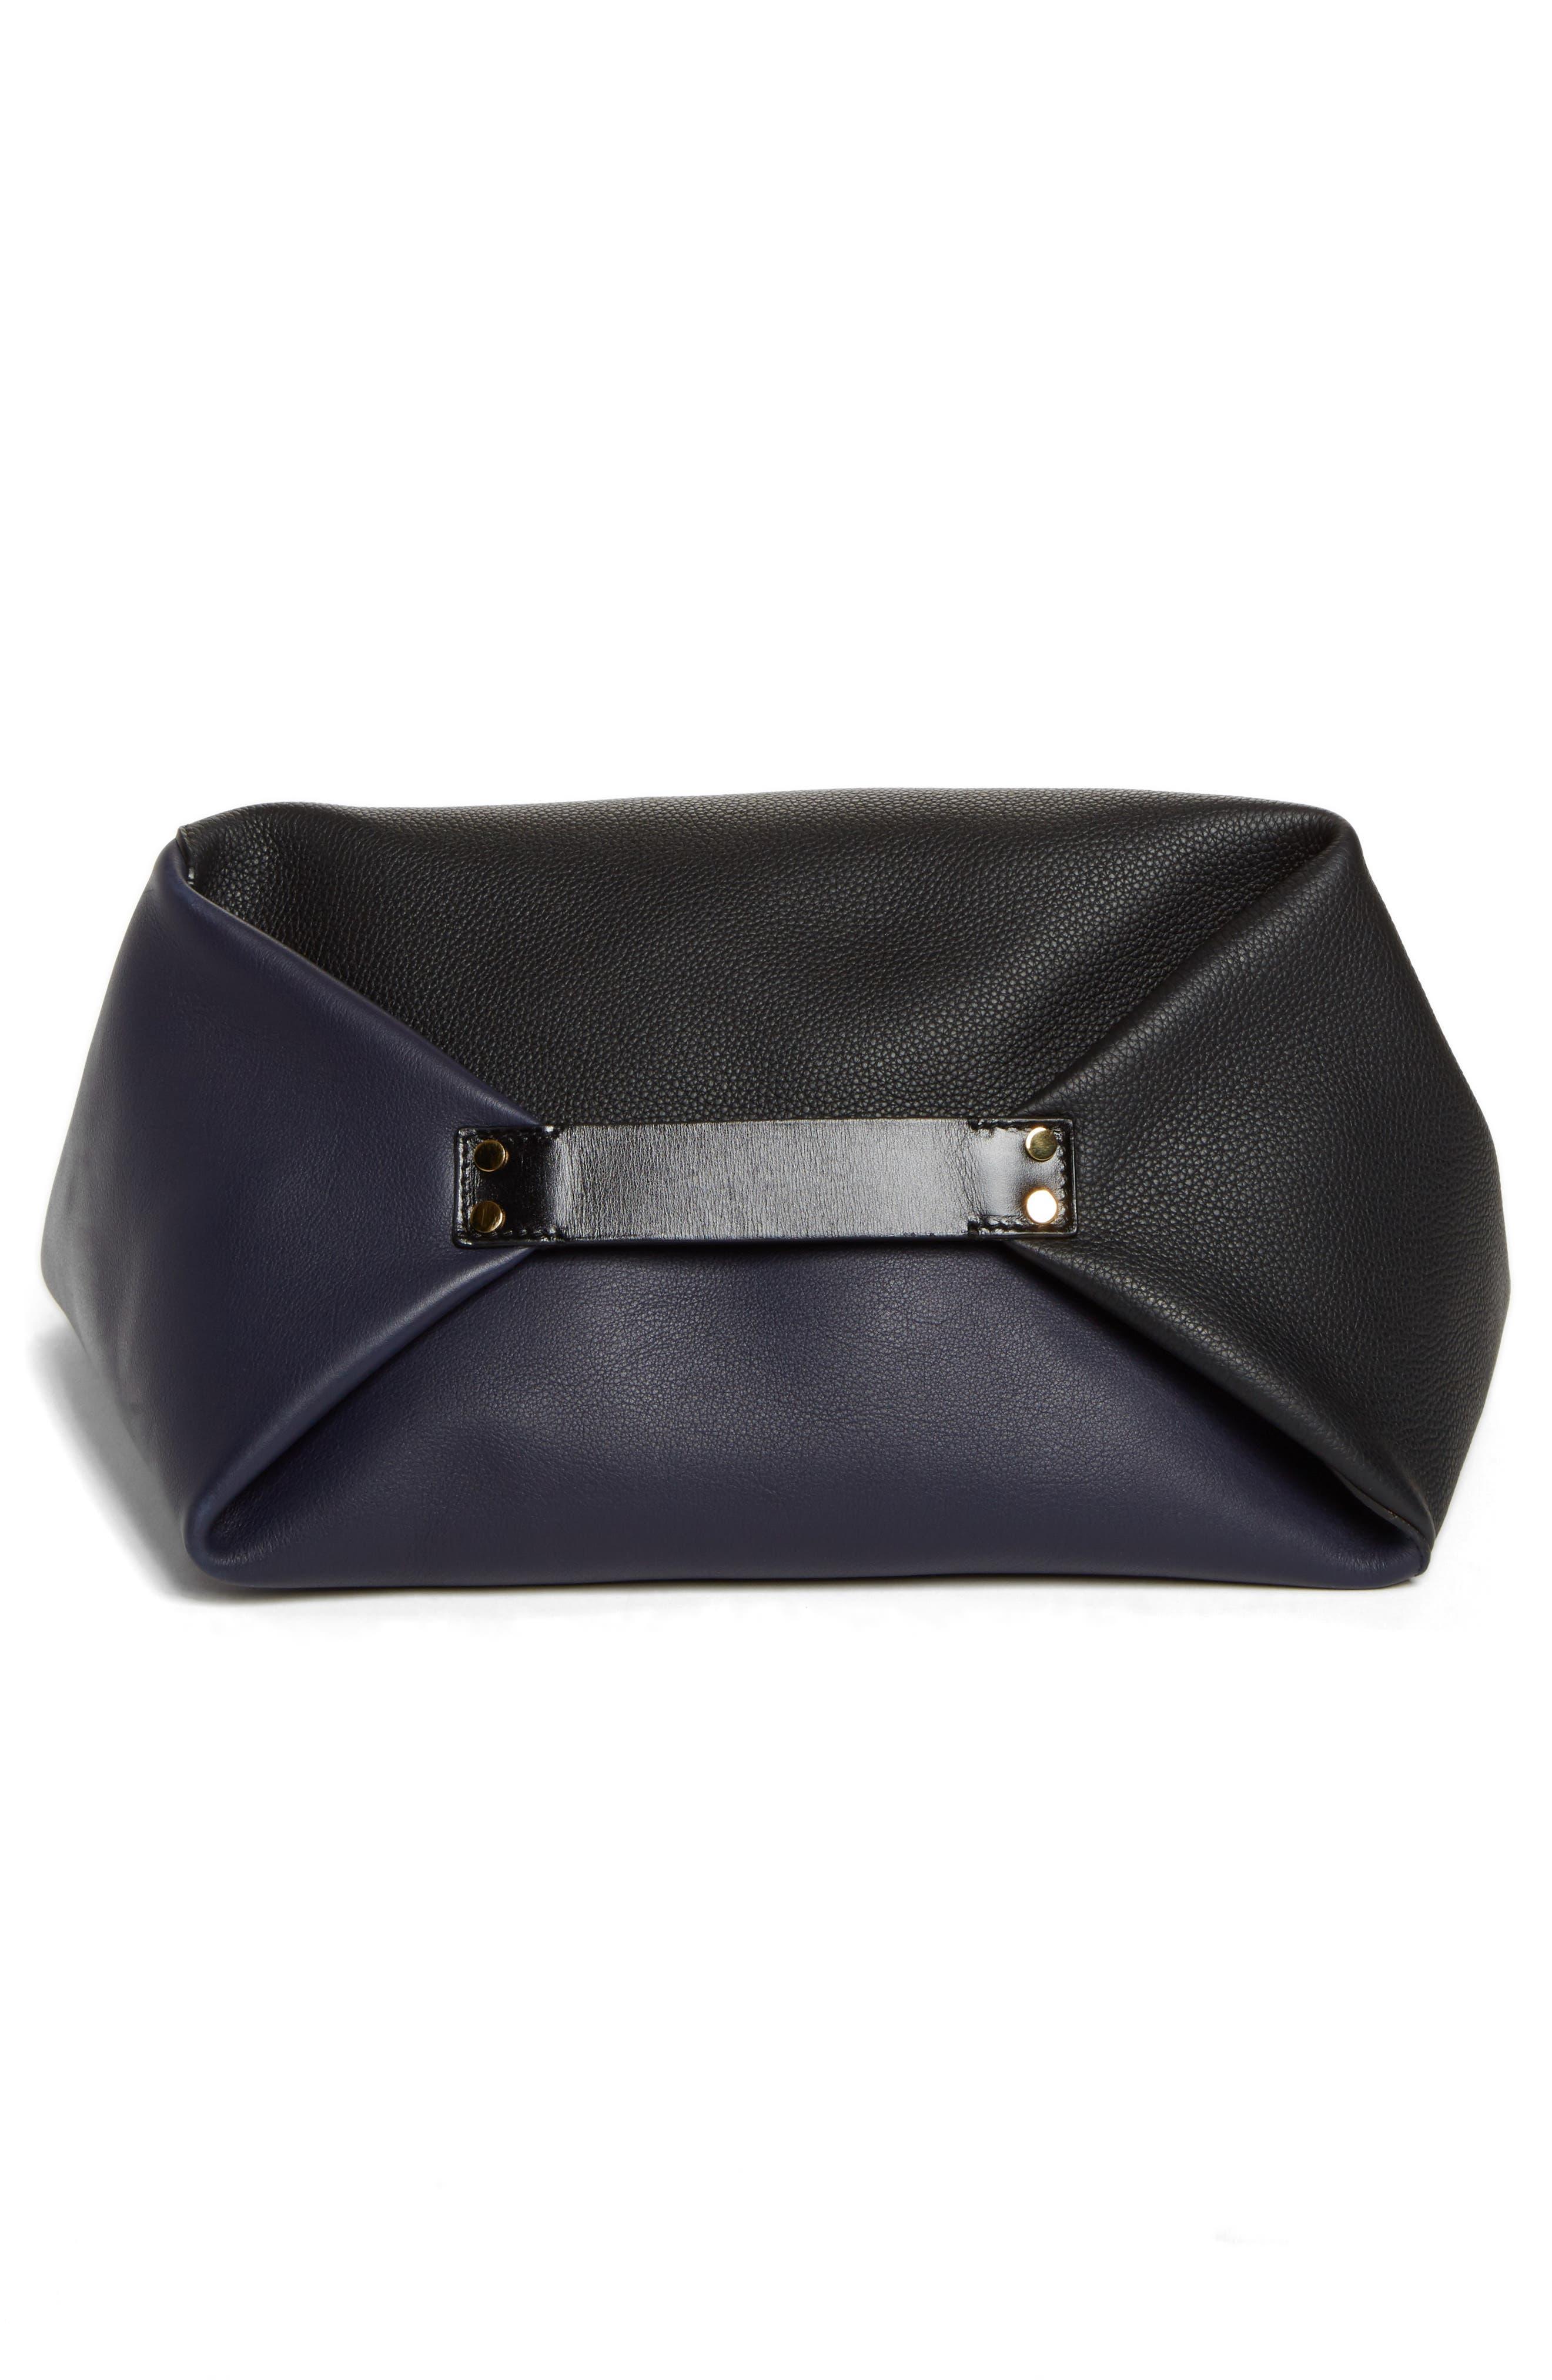 Calfskin Leather Sling Bag,                             Alternate thumbnail 5, color,                             Midnight Blue/ Black